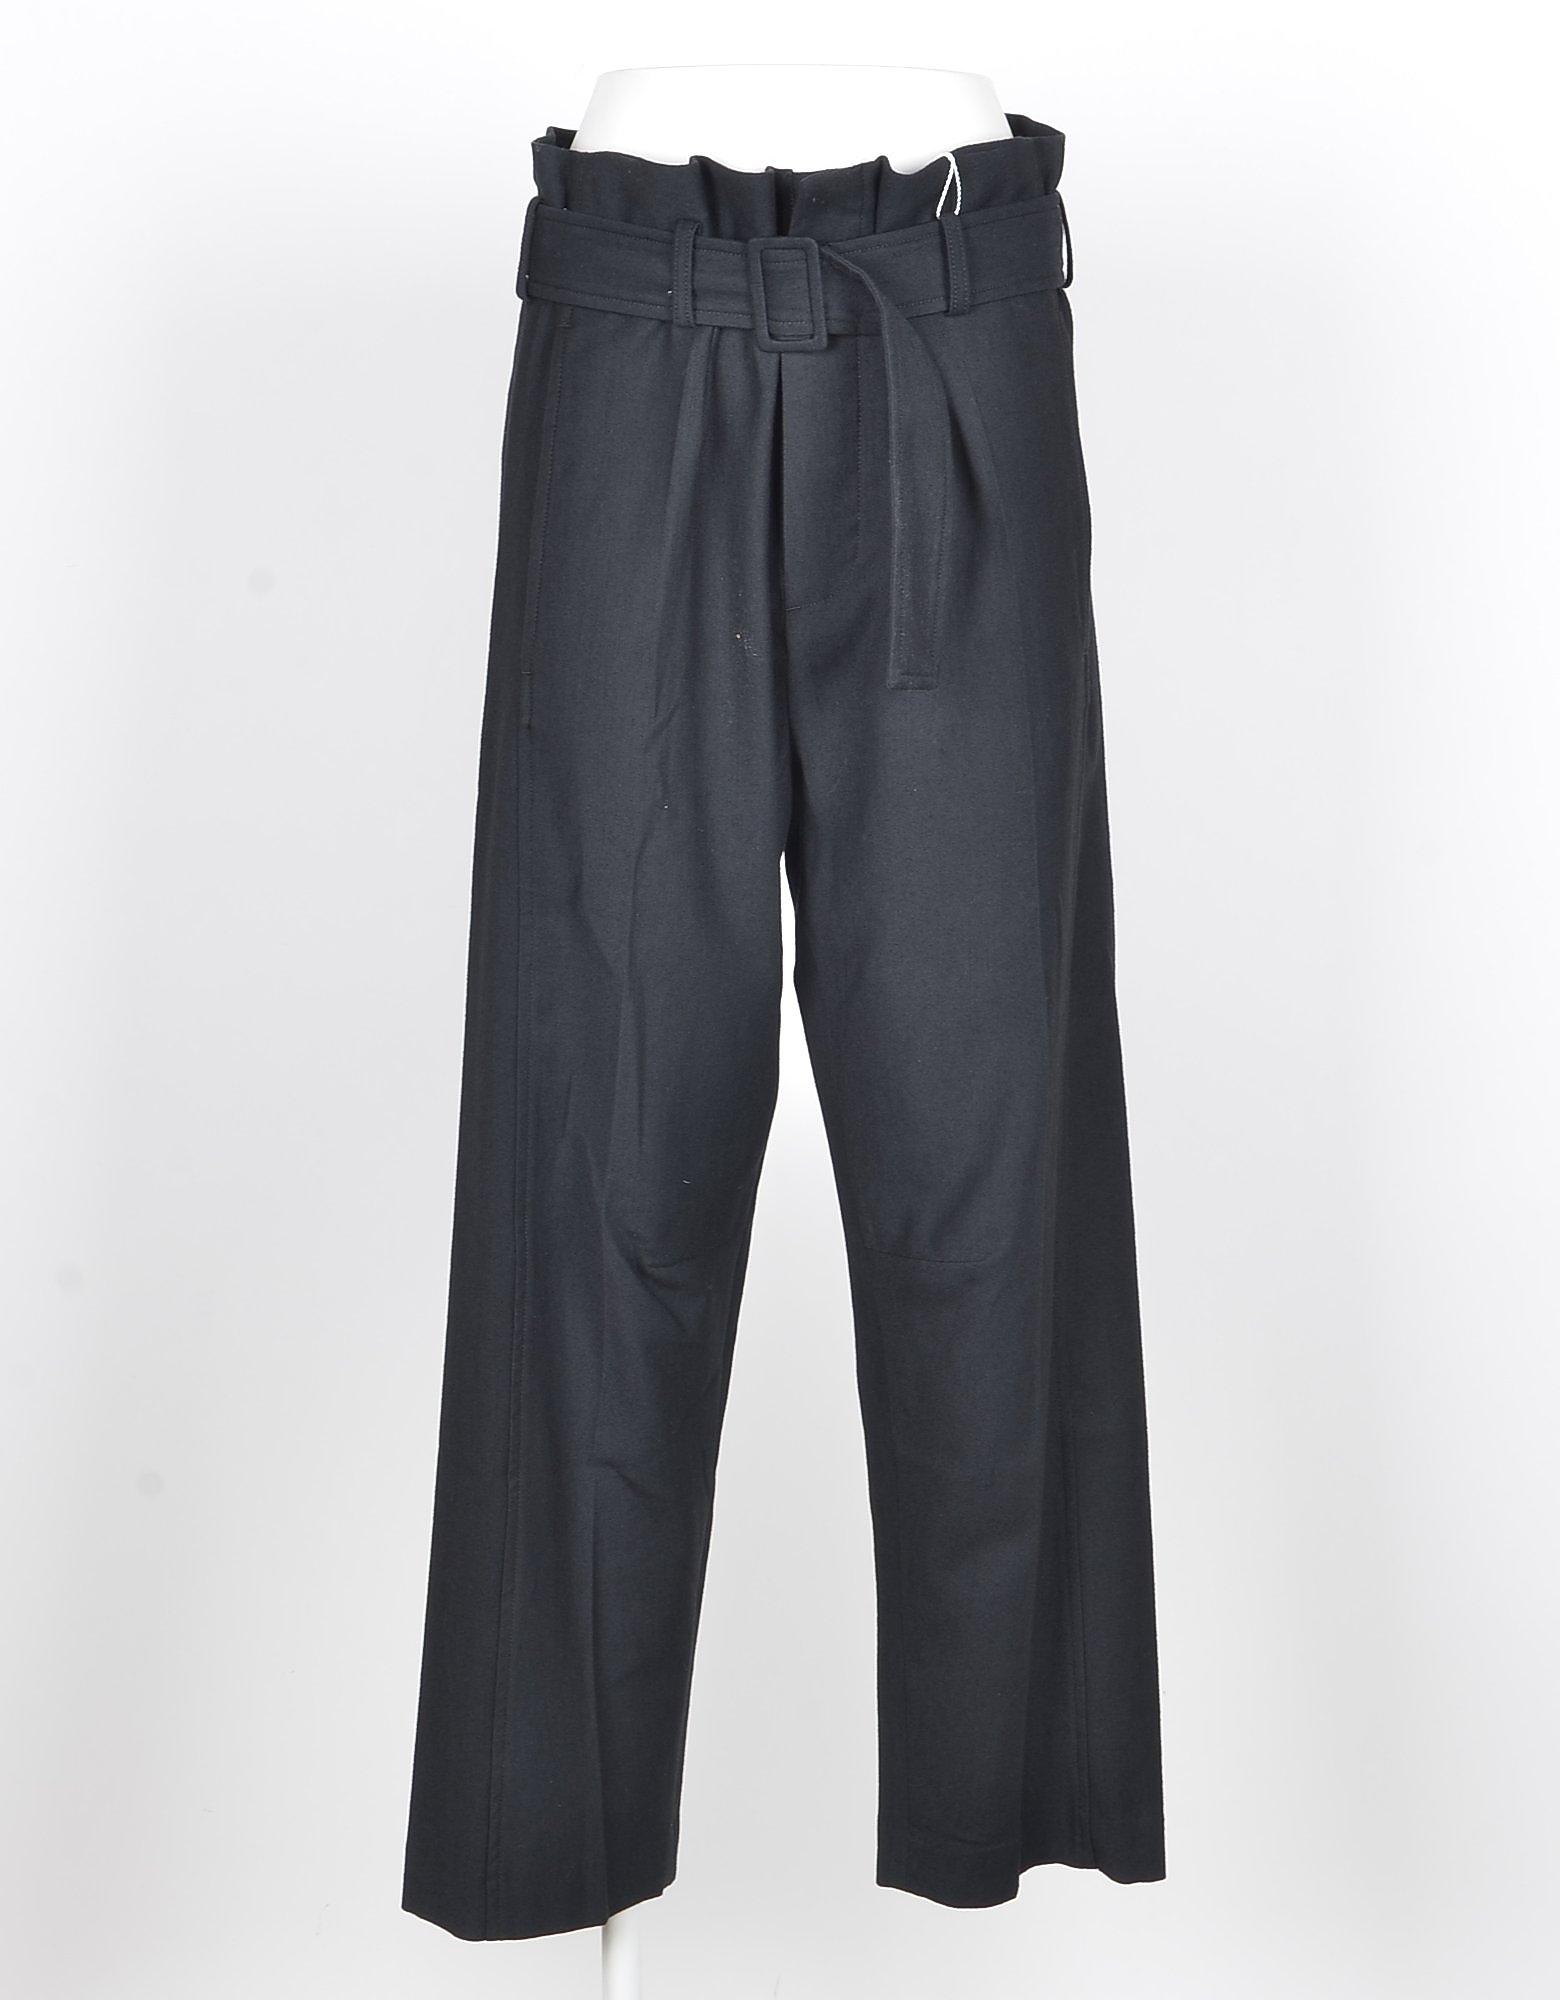 MM6 Maison Martin Margiela Designer Pants, Women's Black Pants